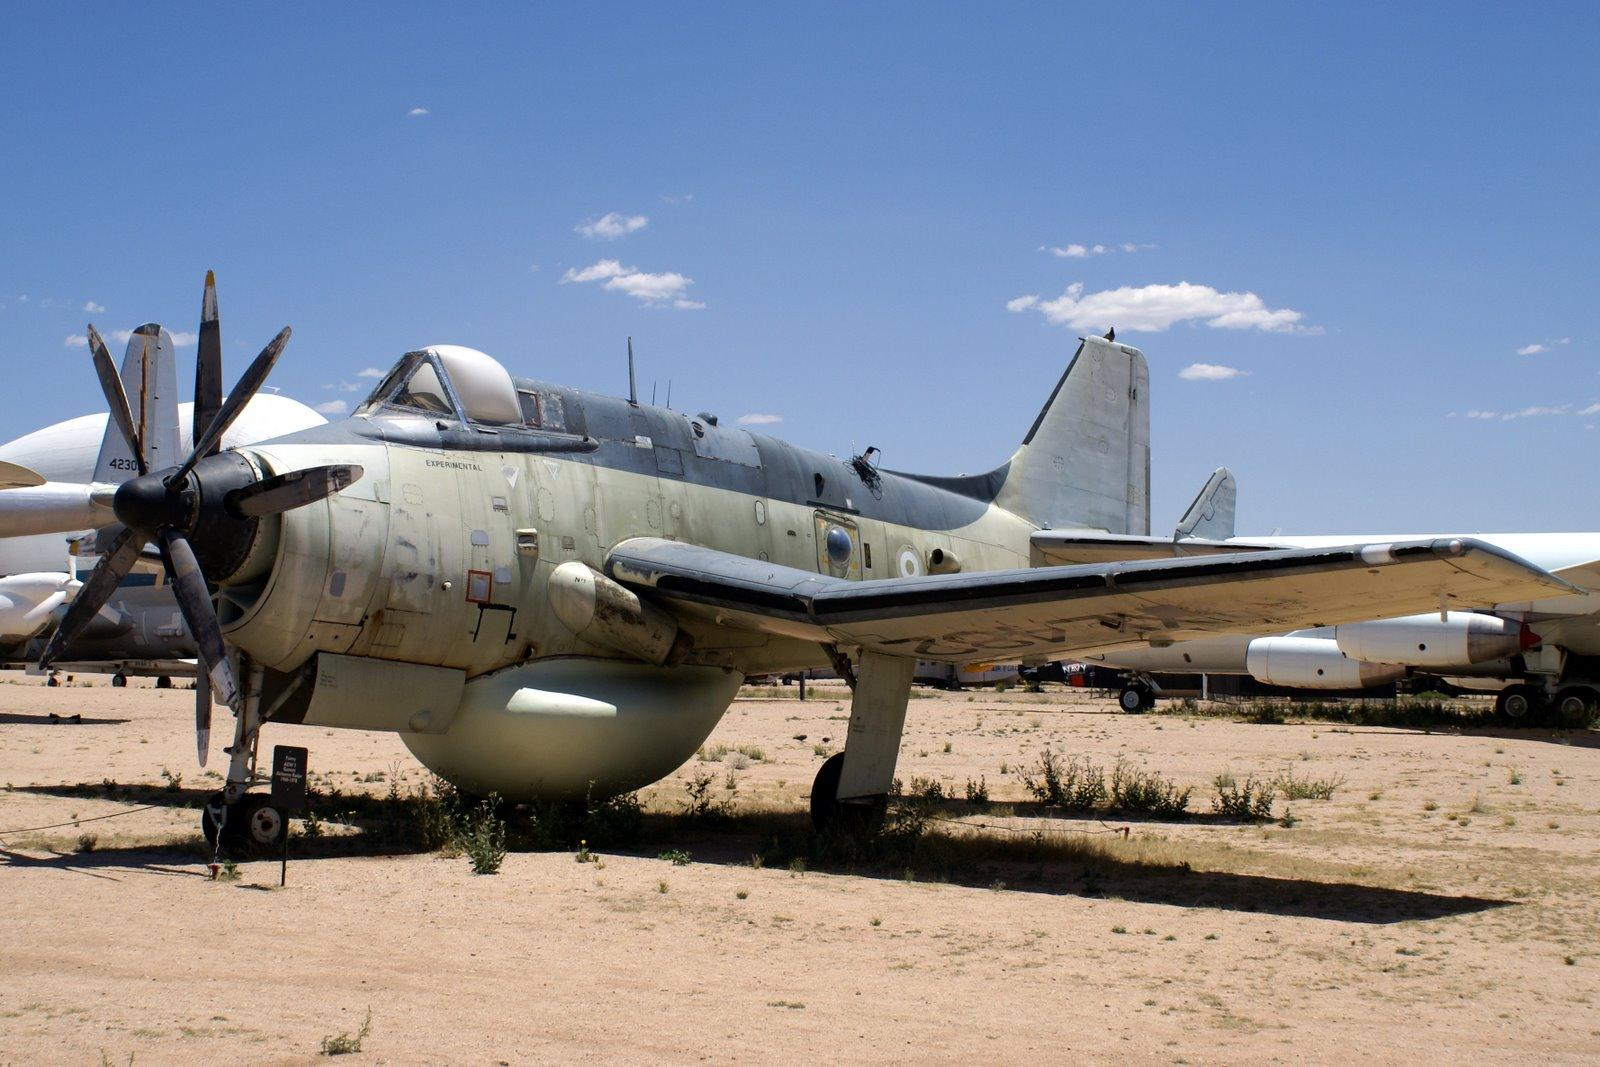 STRANGE MILITARY AIRCRAFT - FAIREY GANNET AEW.3 ROYAL NAVY AIRBORNE RADAR PLANE